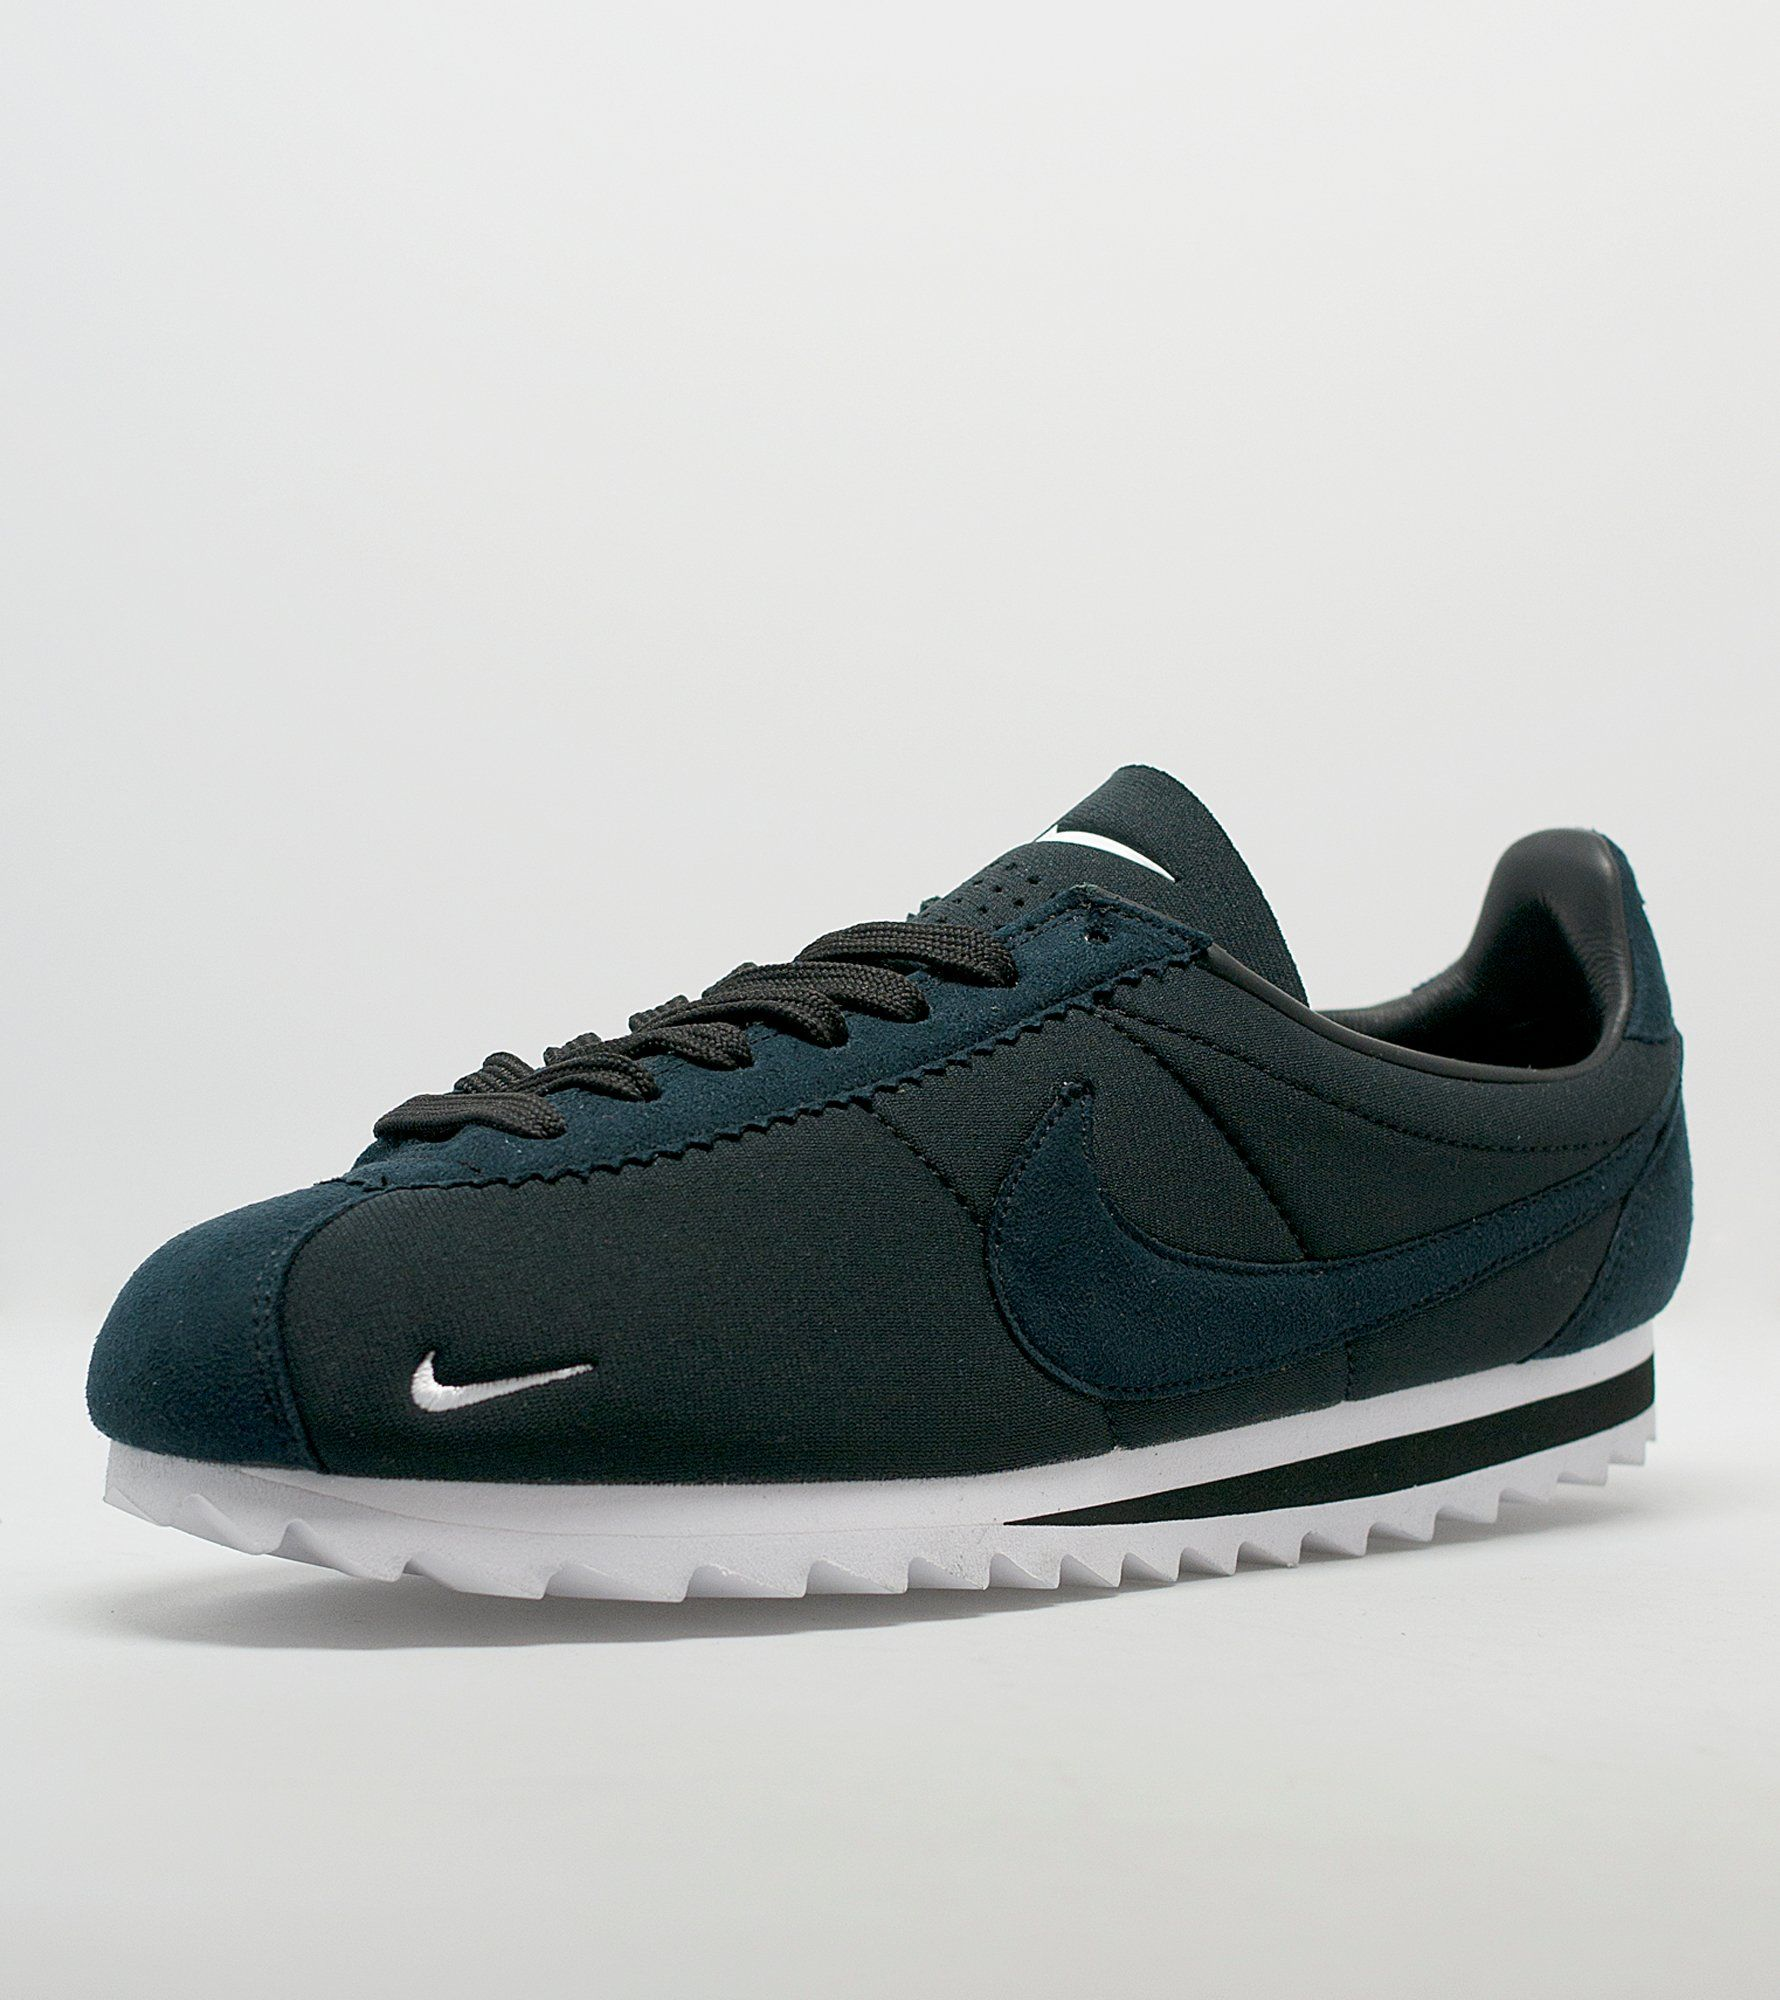 sports shoes 244a3 b80bb france nike cortez grey big tooth 245be fb5ec